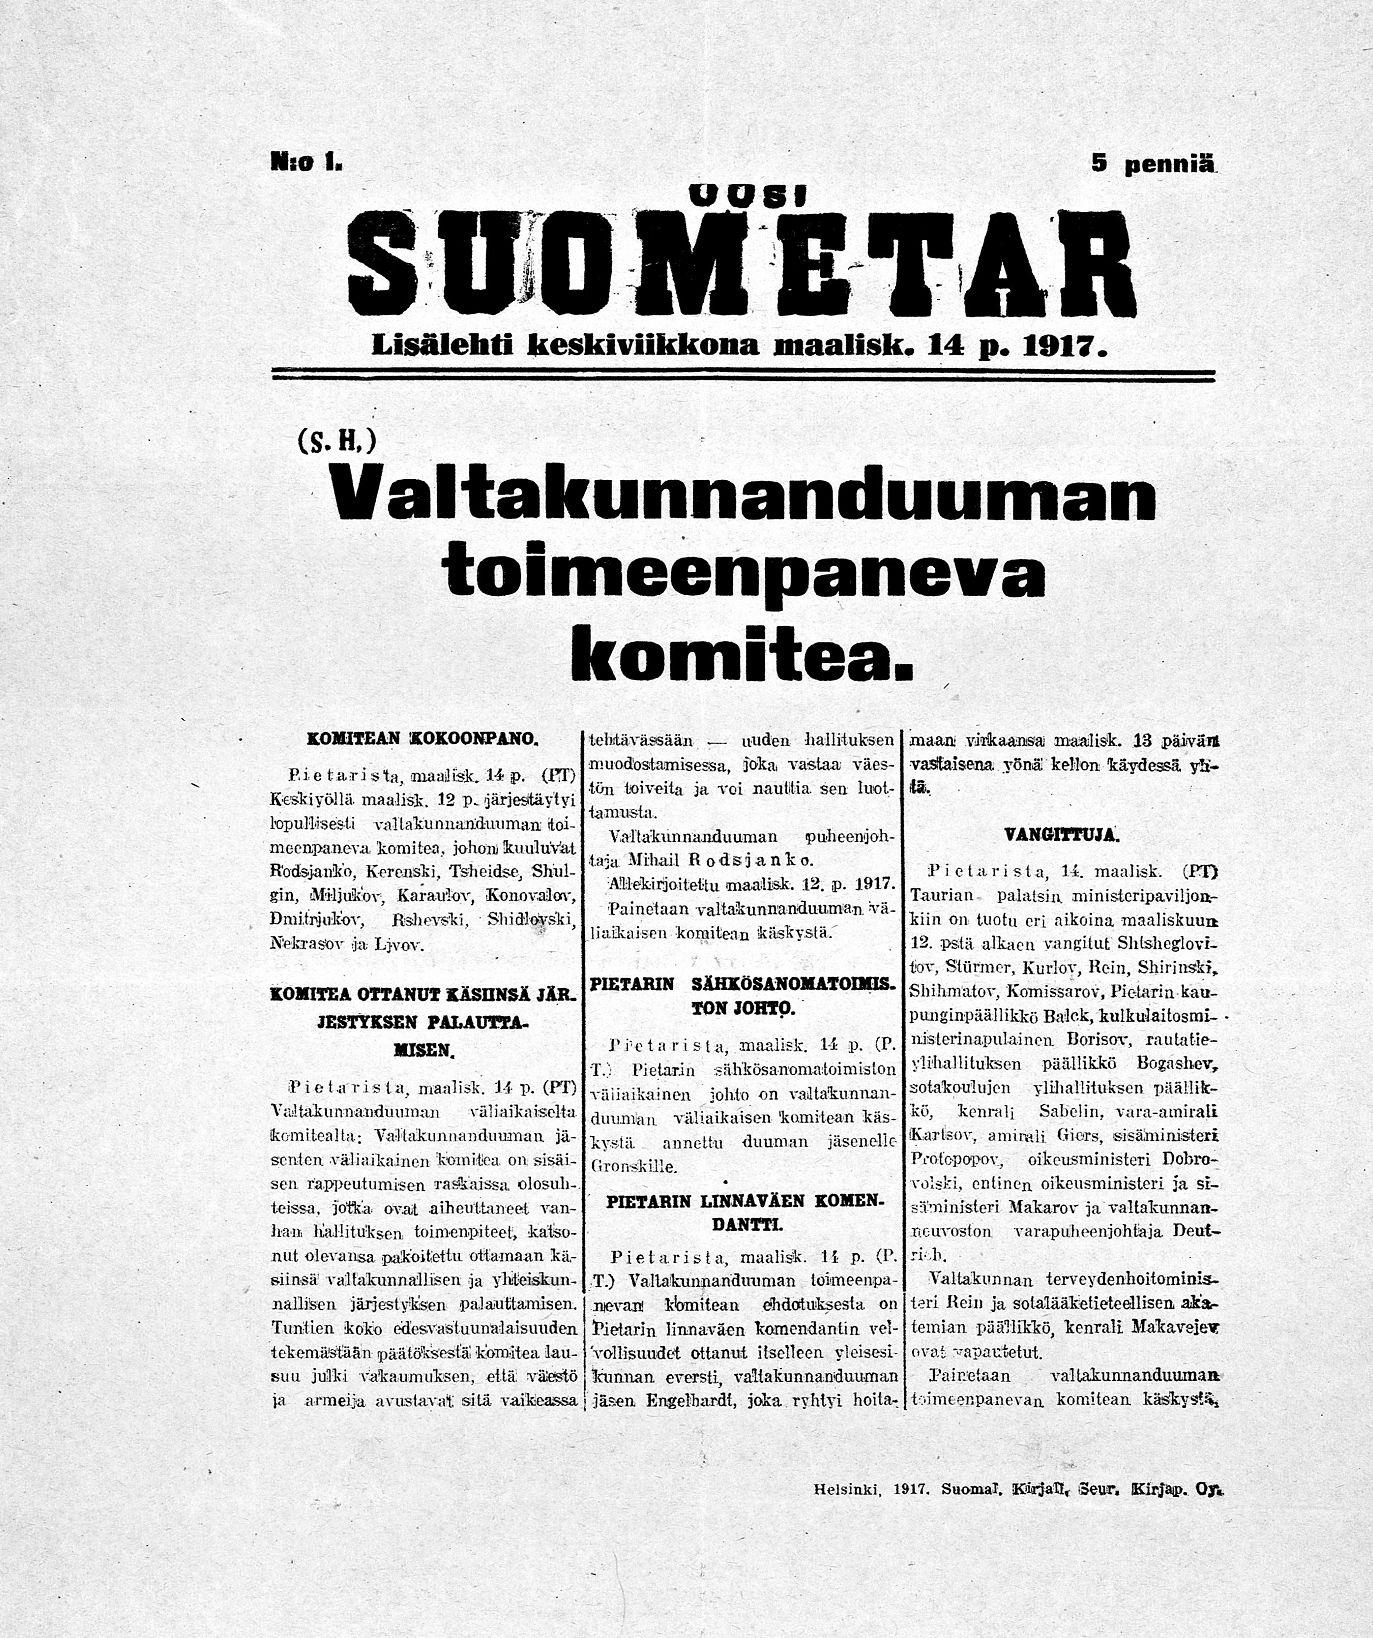 Uusi Suometar_14.3.1917